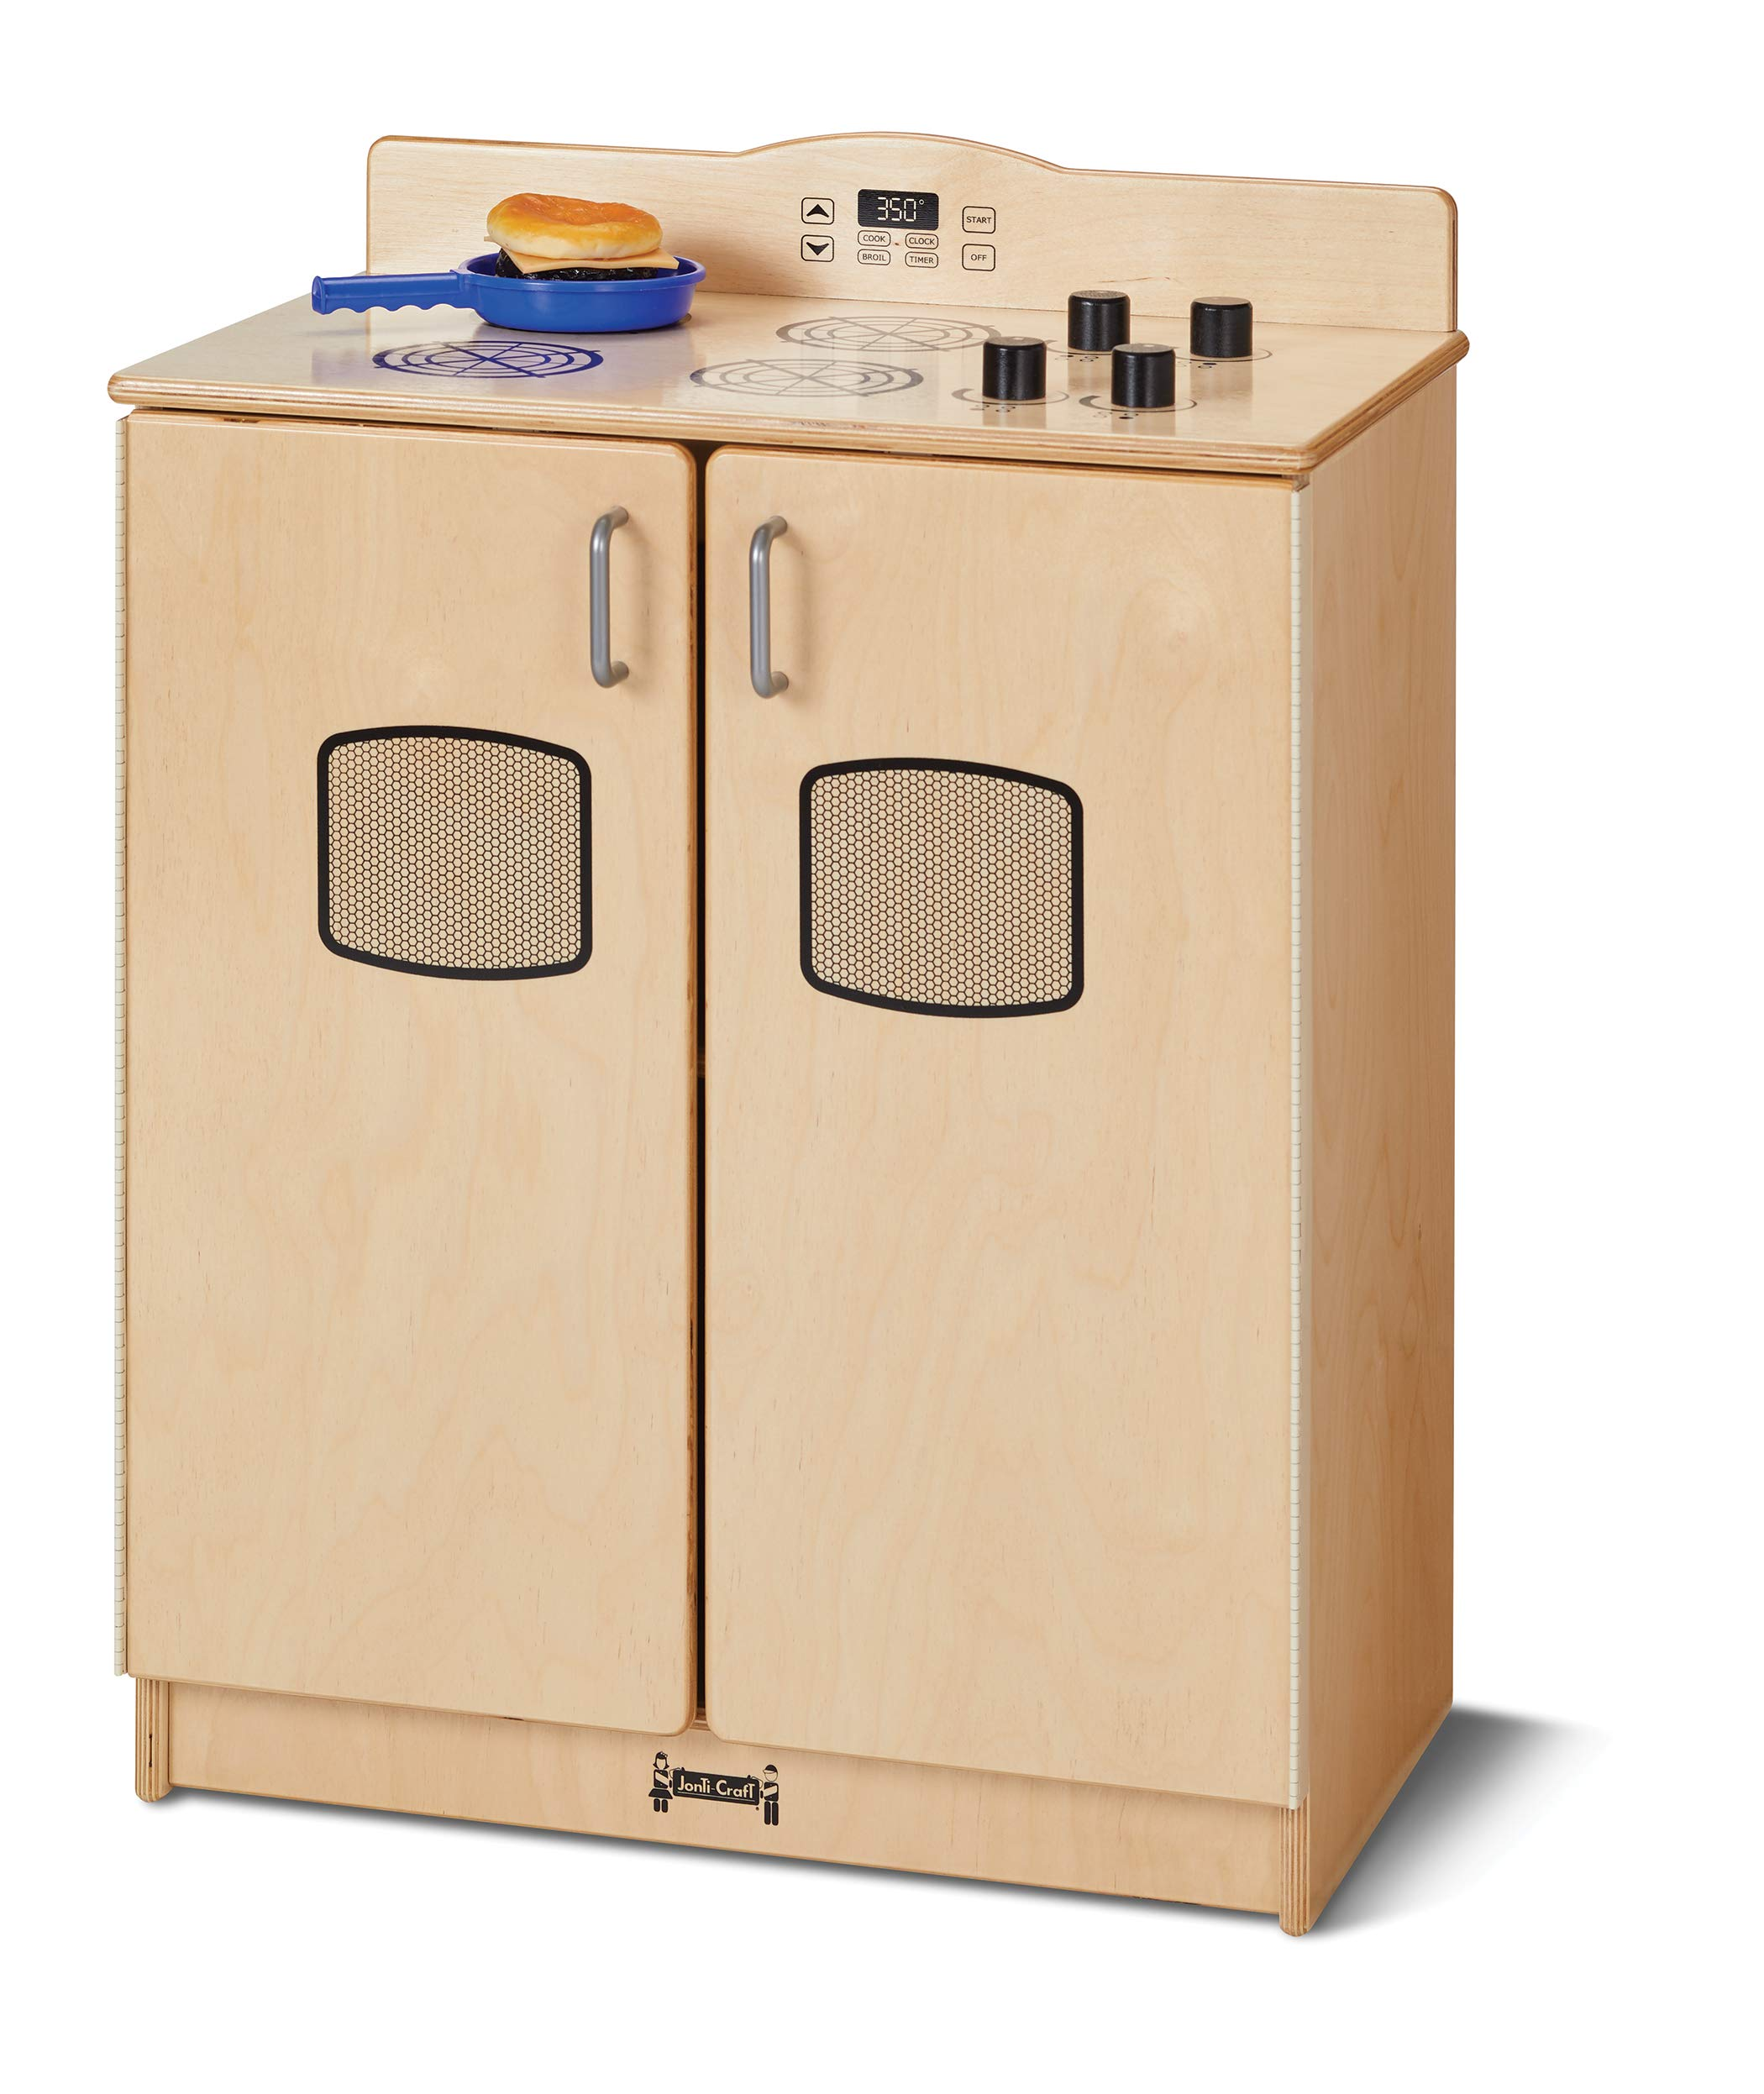 Jonti-Craft 2409SA Culinary Creations School Age Kitchen Stove